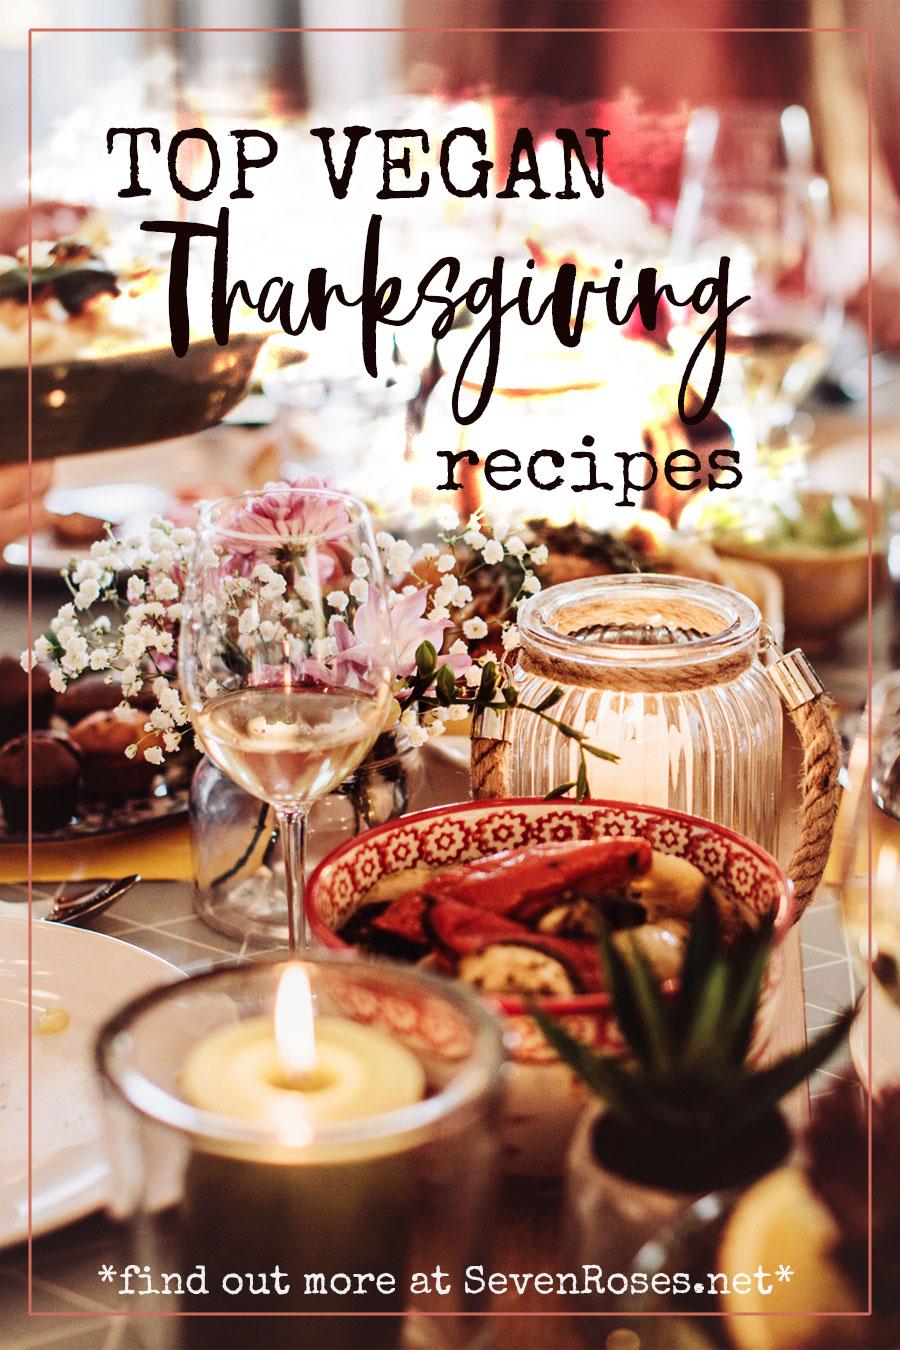 Top Vegan Thanksgiving recipes